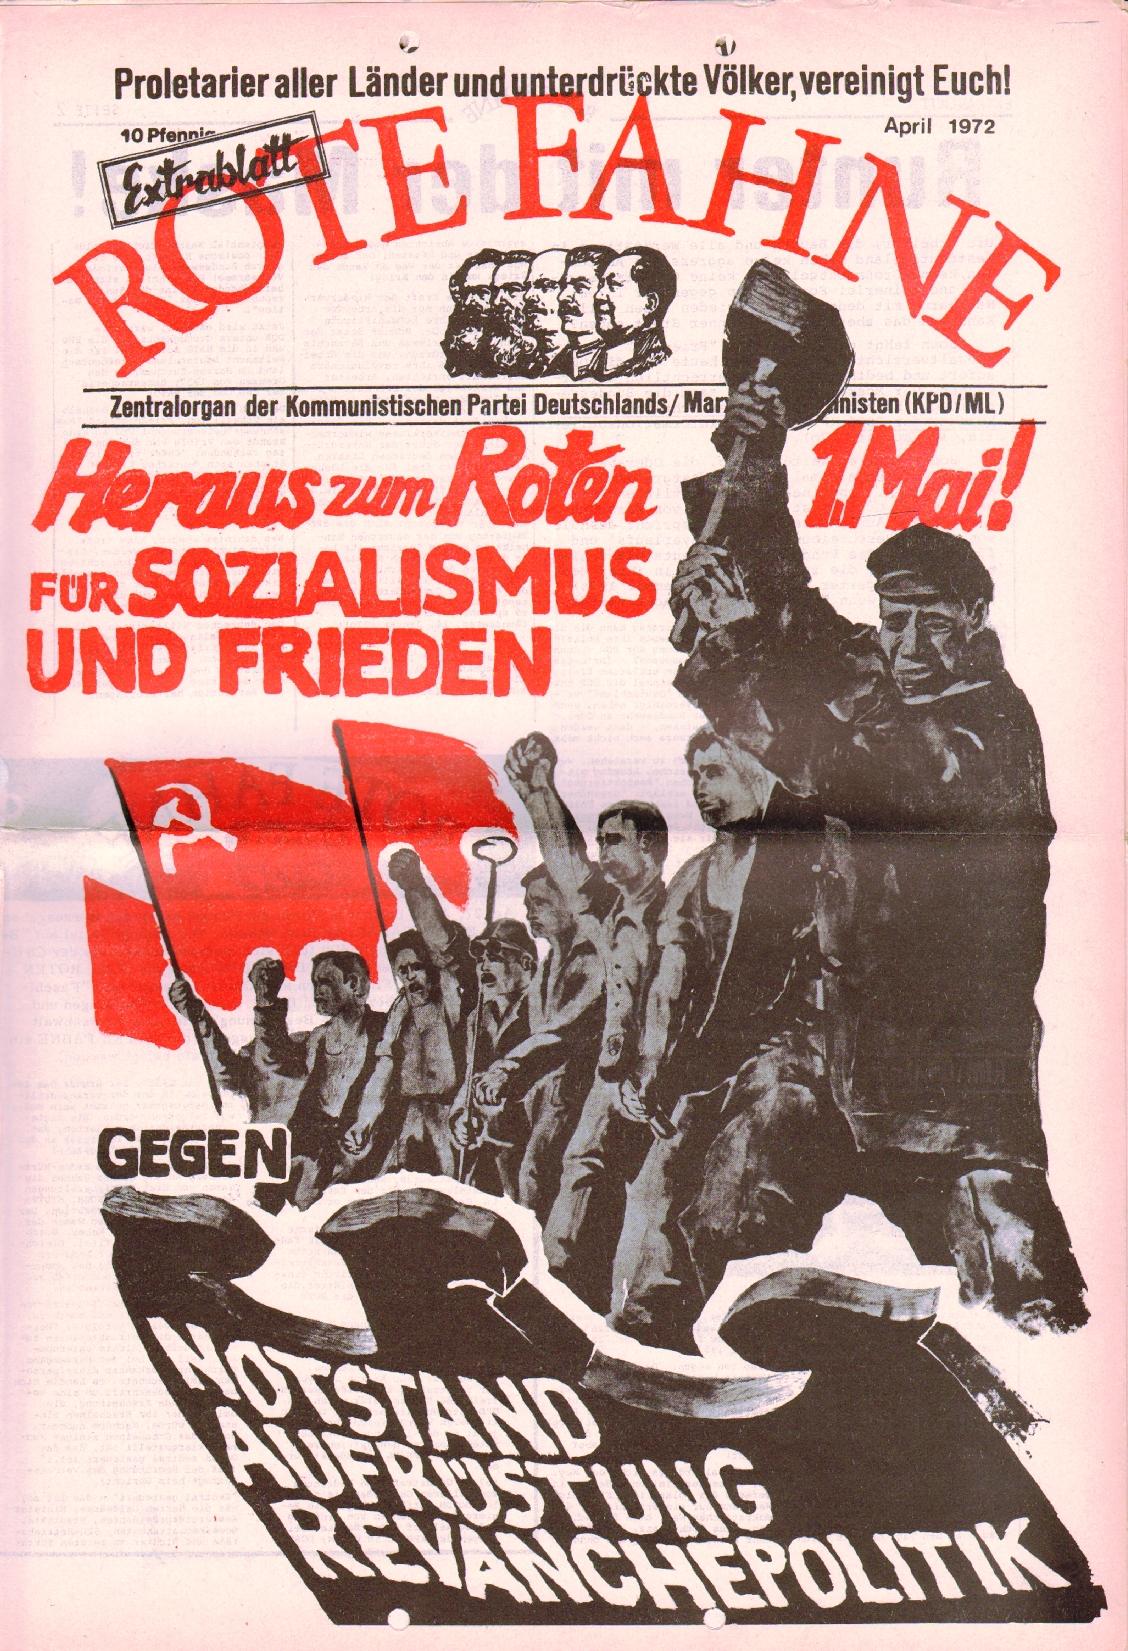 Rote Fahne, 3. Jg., April 1972, Extrablatt, Seite 1